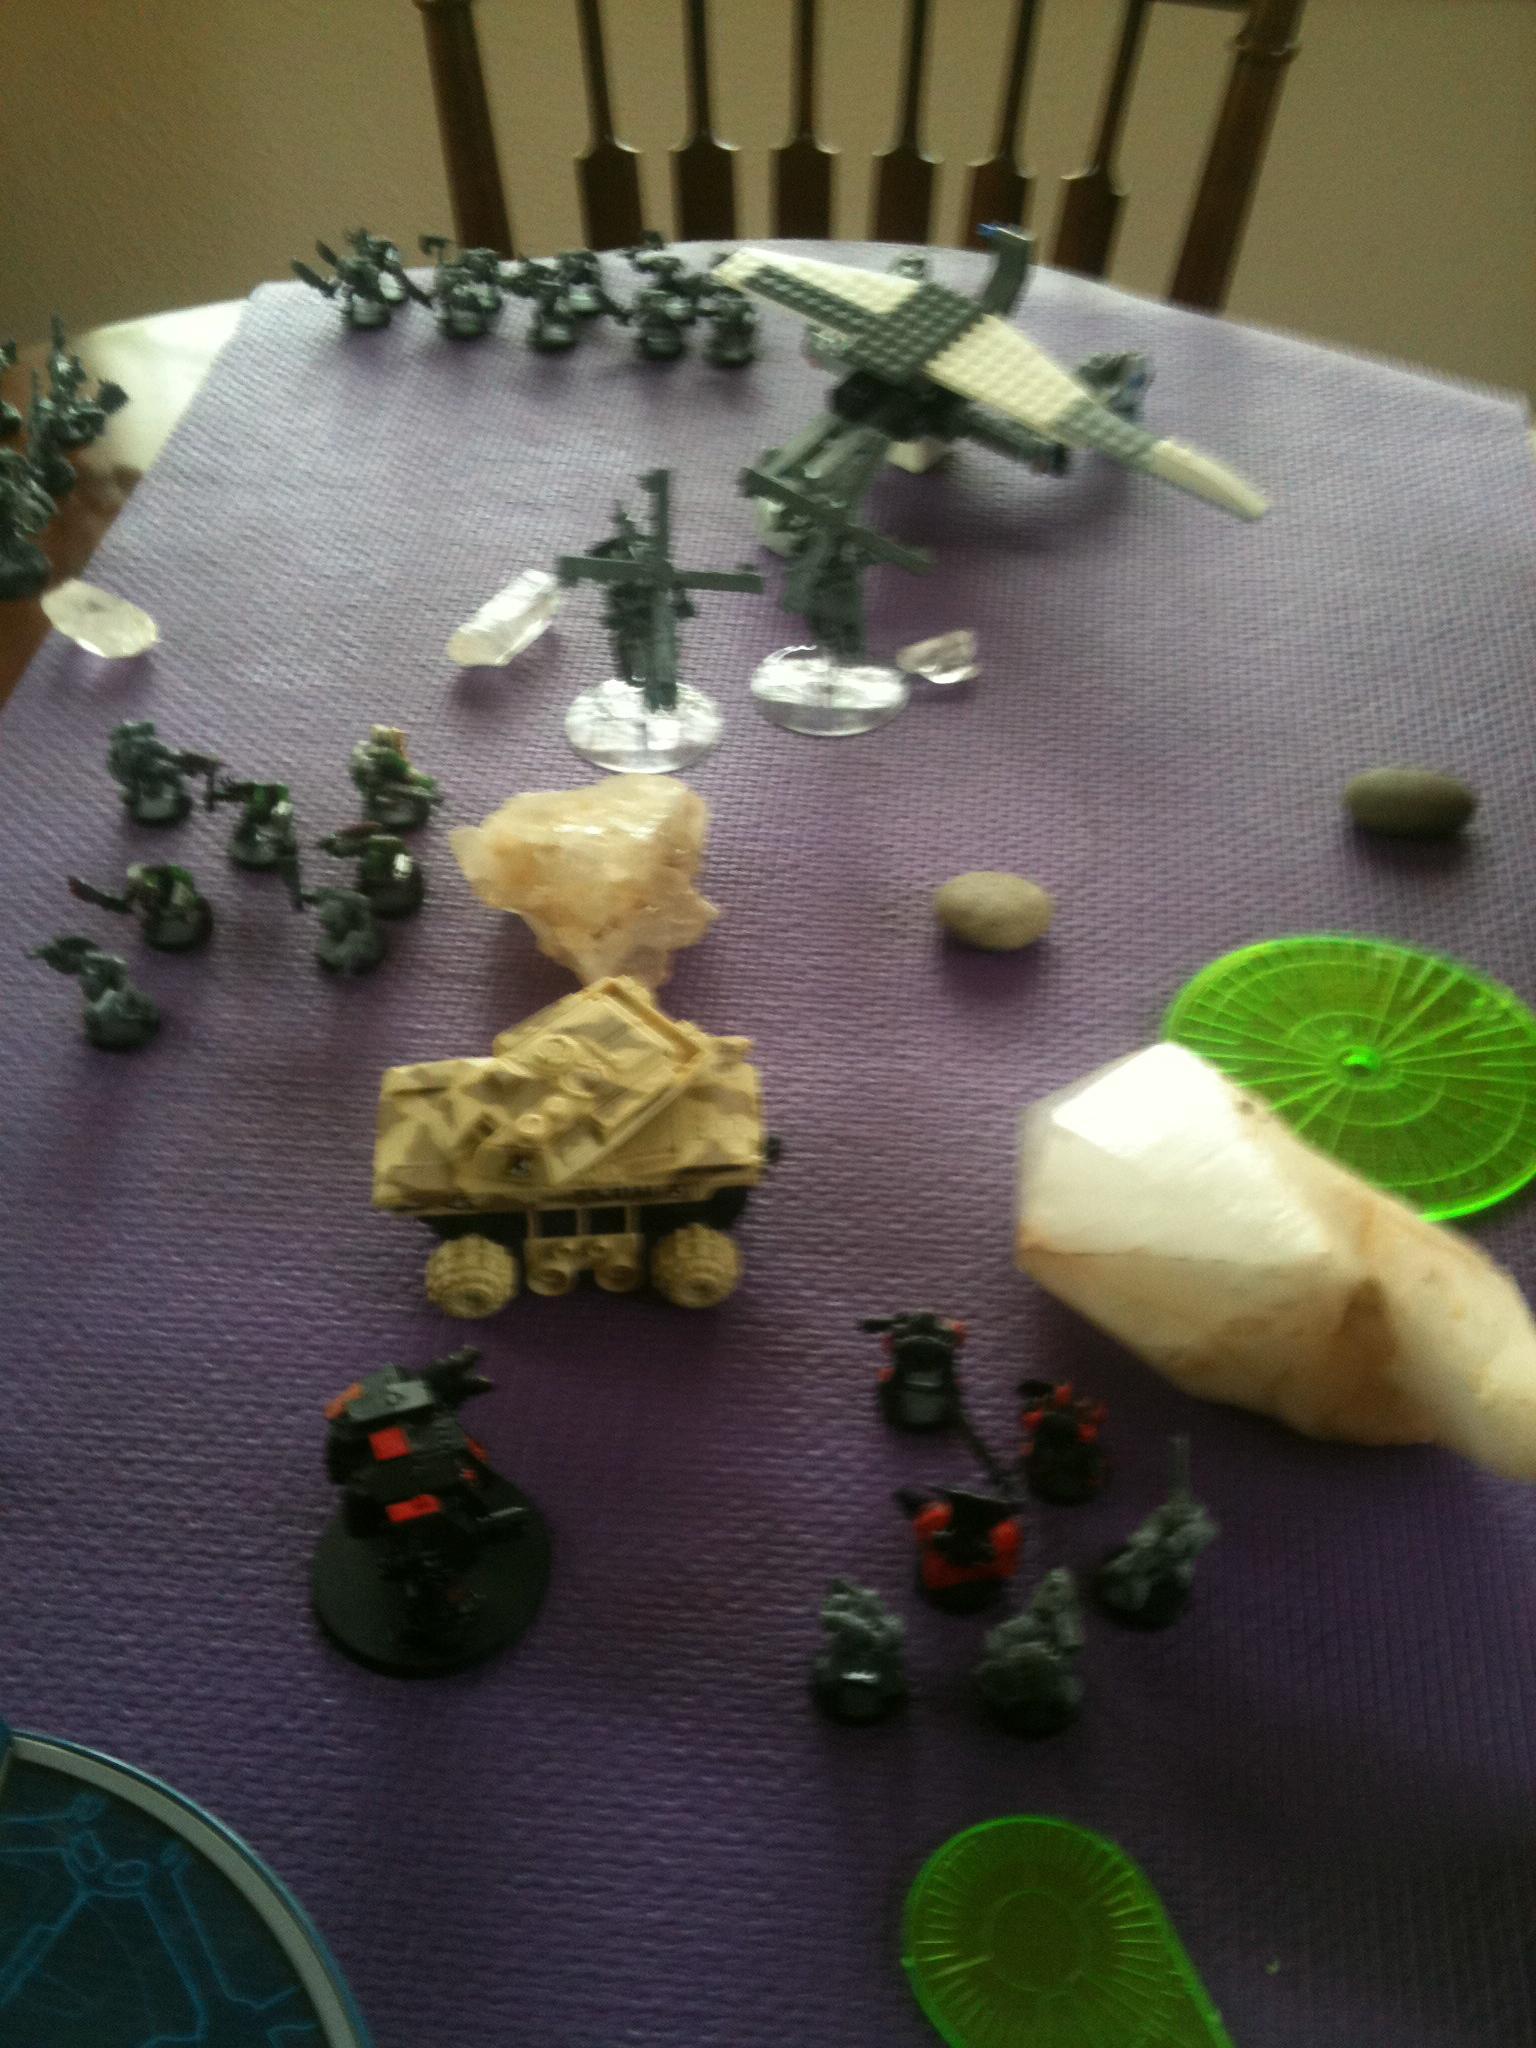 Battle, Boy, Dreadnought, Orks, Space, Space Marines, Warhammer 40,000, Warhammer Fantasy